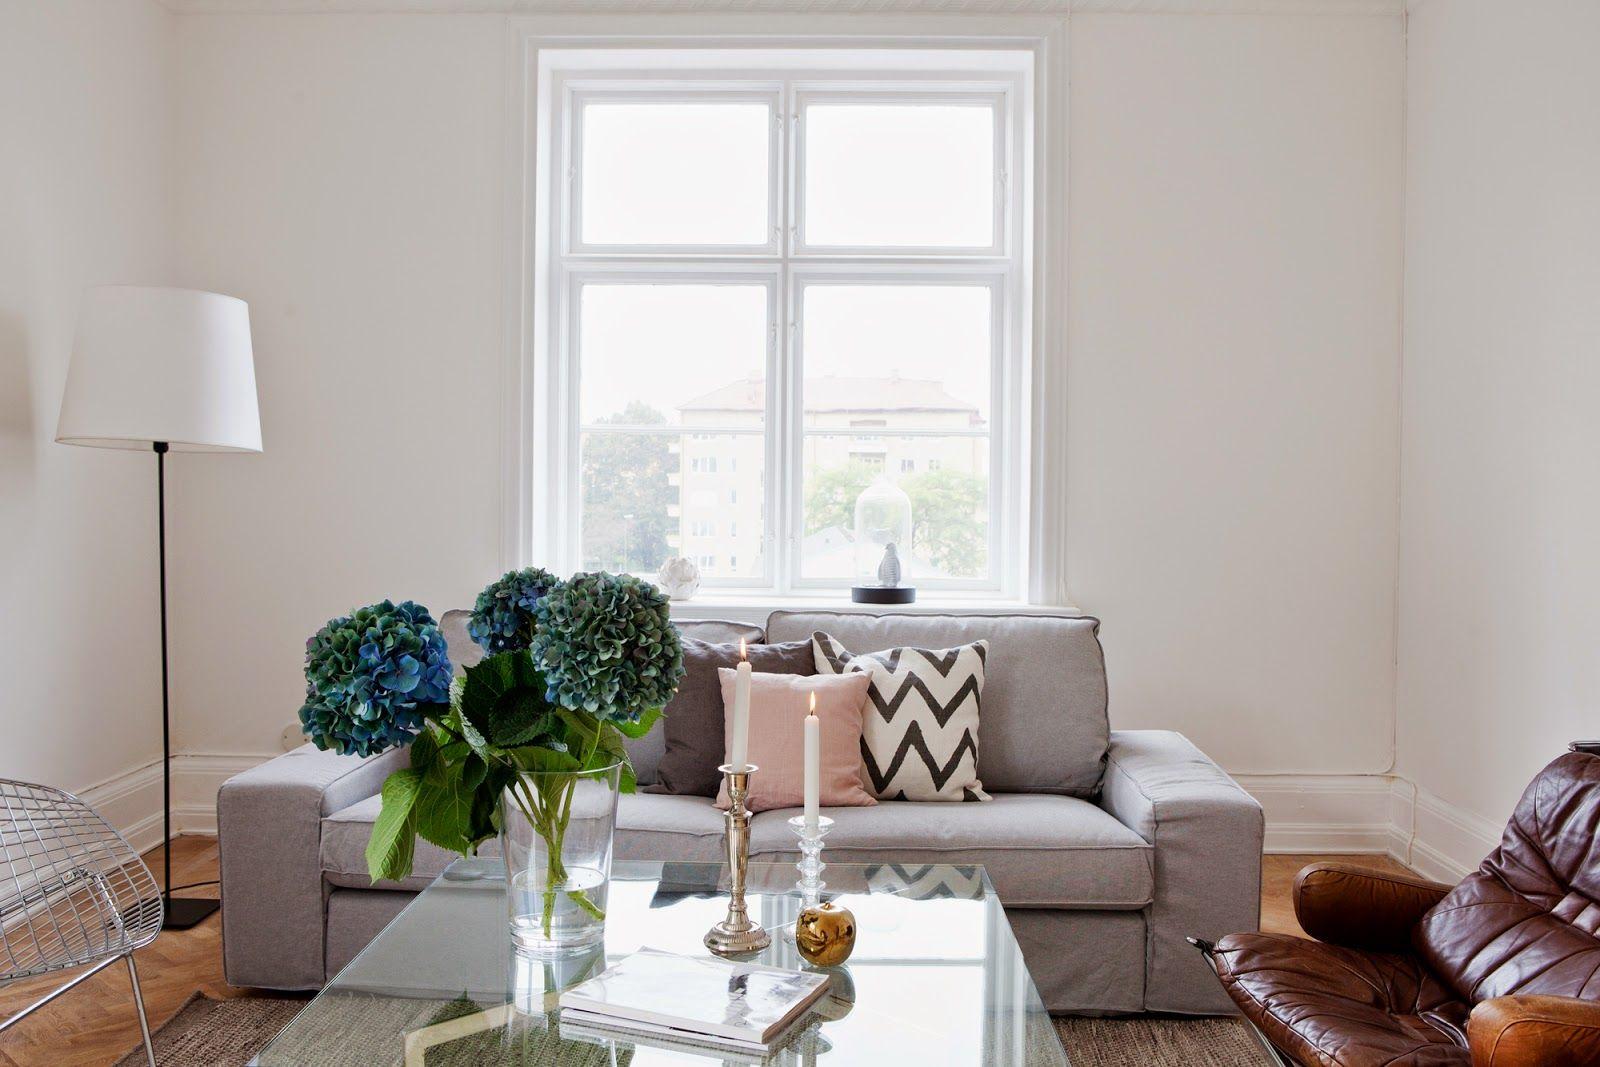 A Calm White Blue And Cognac Malm Home Living Pinterest  # Tapar Muebles Feos